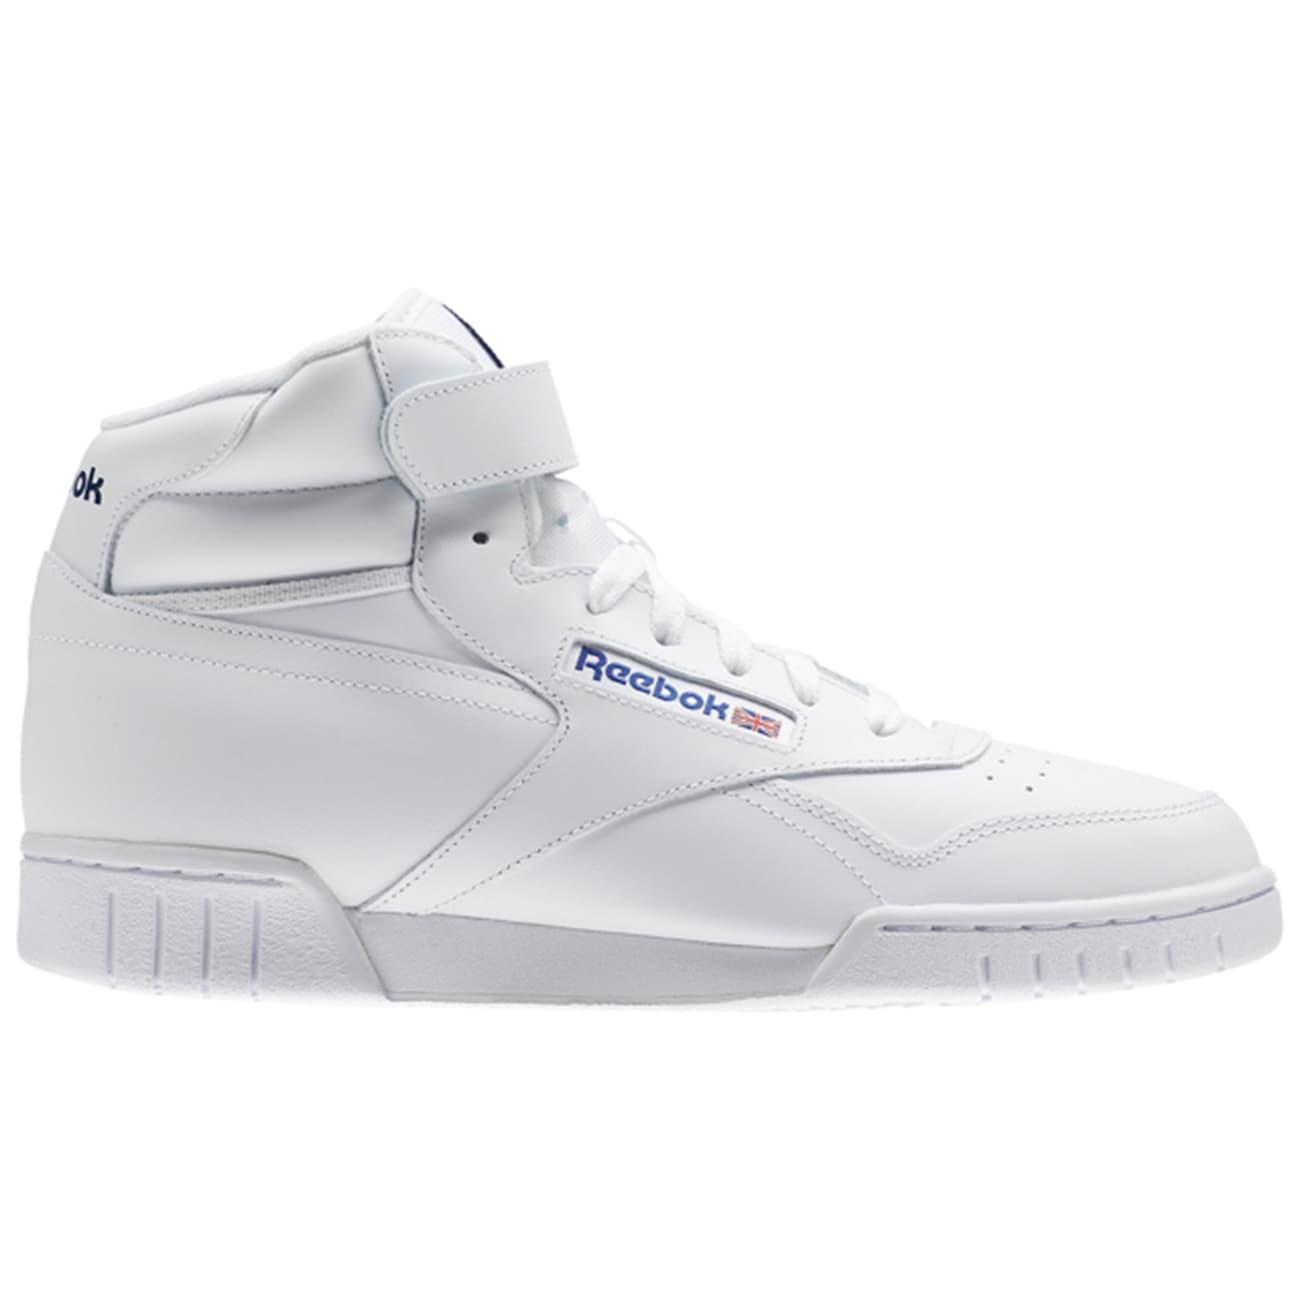 gg_sneakerhead_3